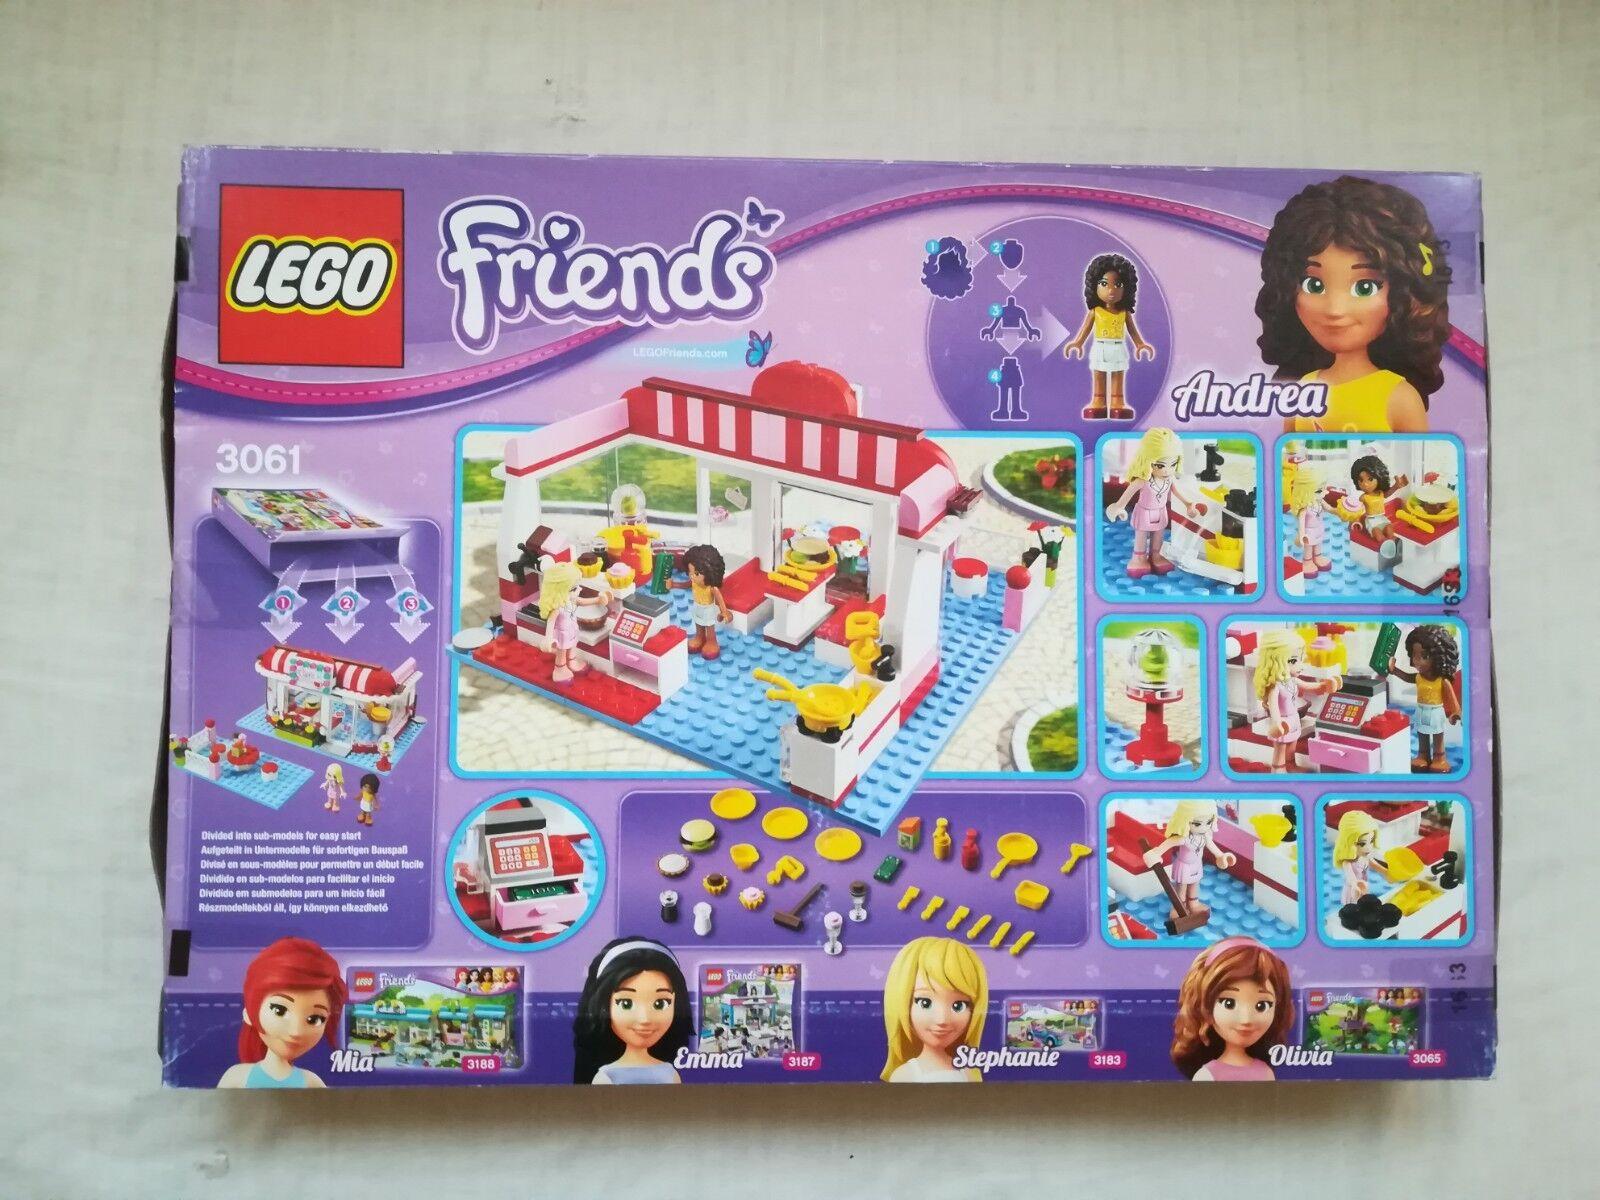 3061 Scellé Lego Friends Park Cafe Neuf City 80mnvNOw